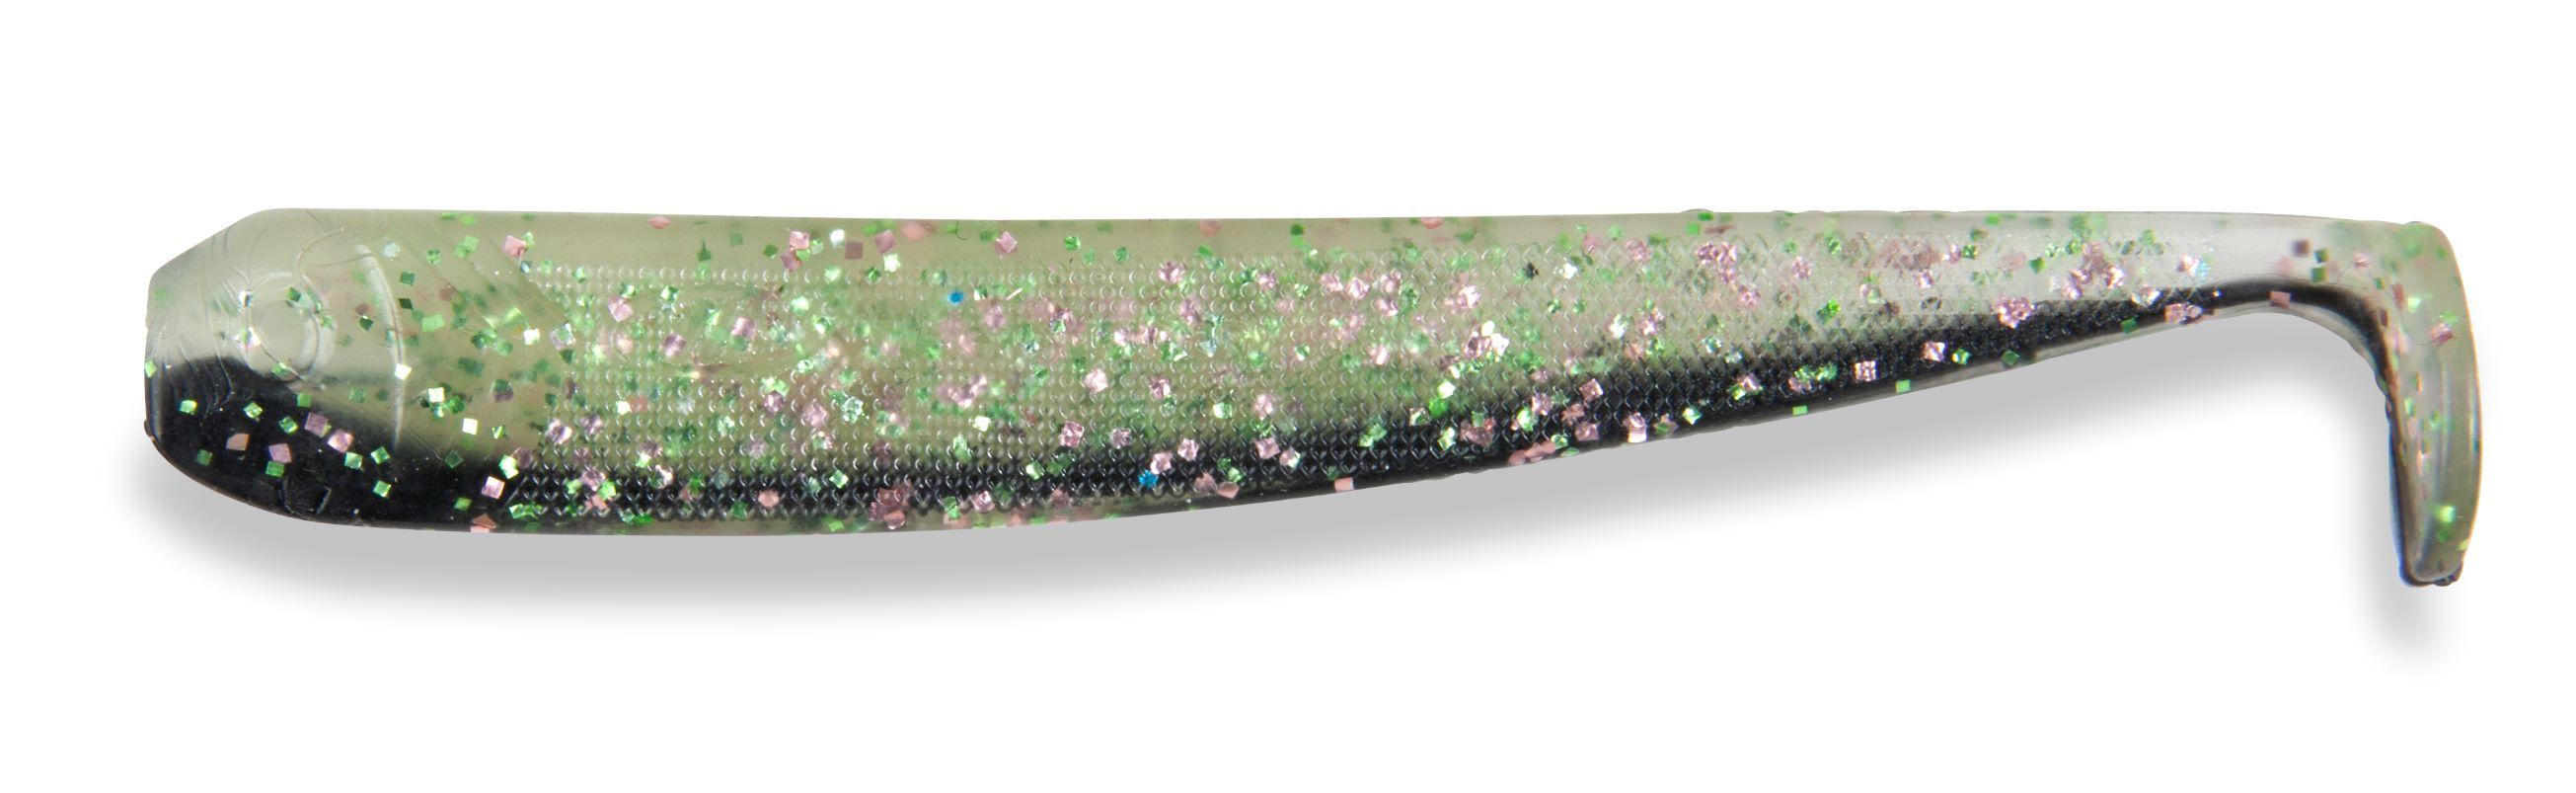 Iron Claw Moby Long Shad 2.0 BU, 1ks